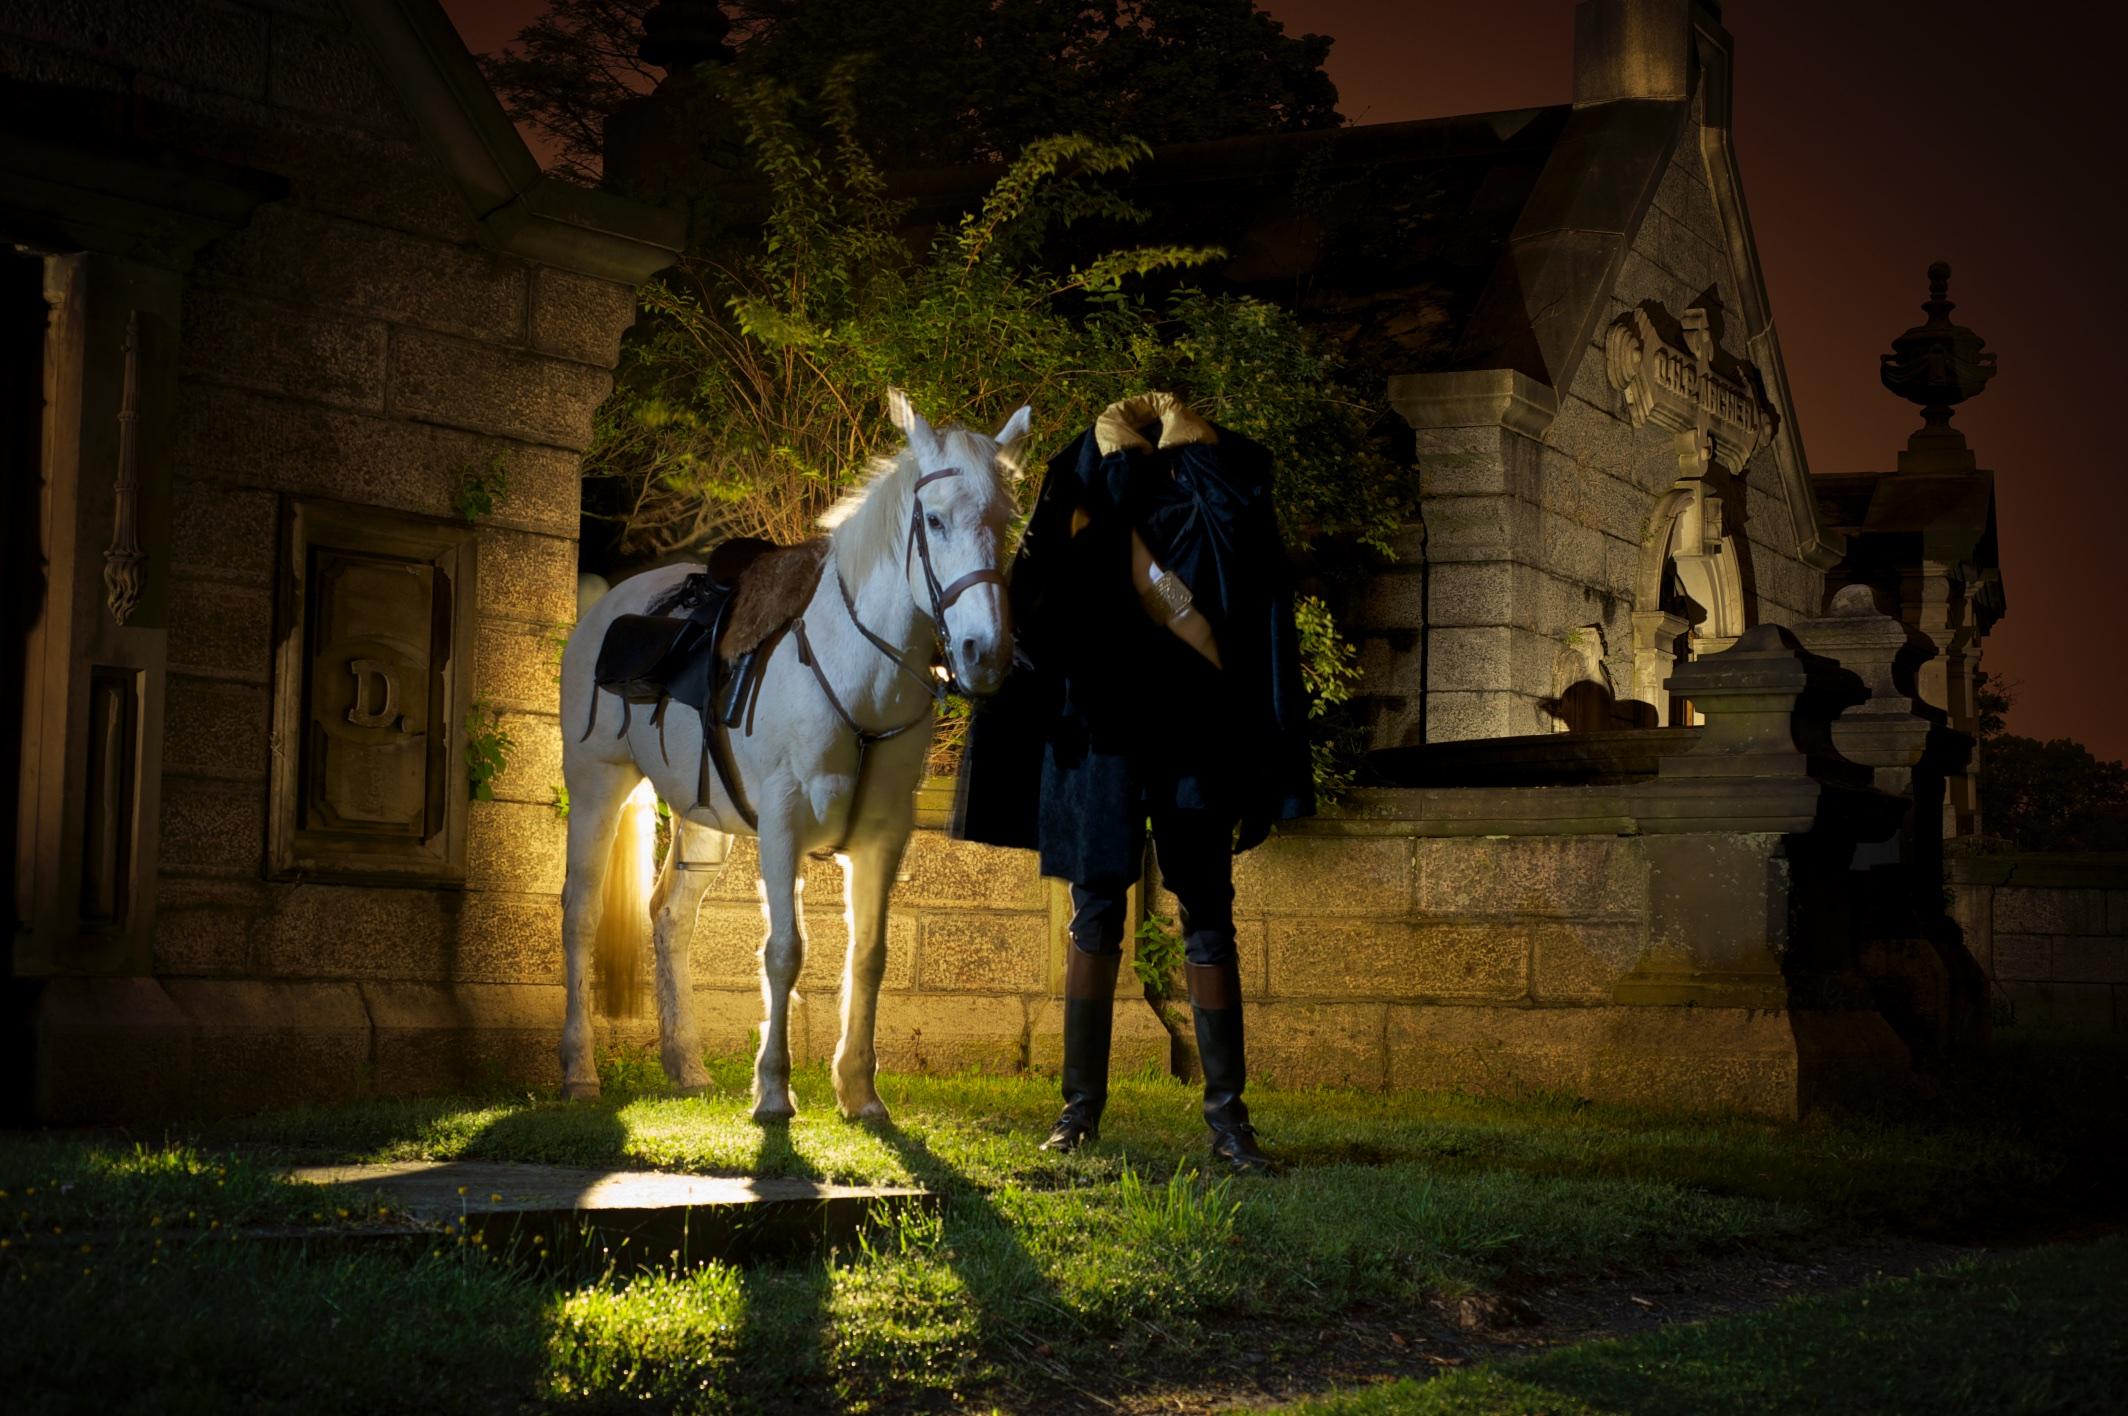 headless horseman at Sleepy Hollow Cemetery